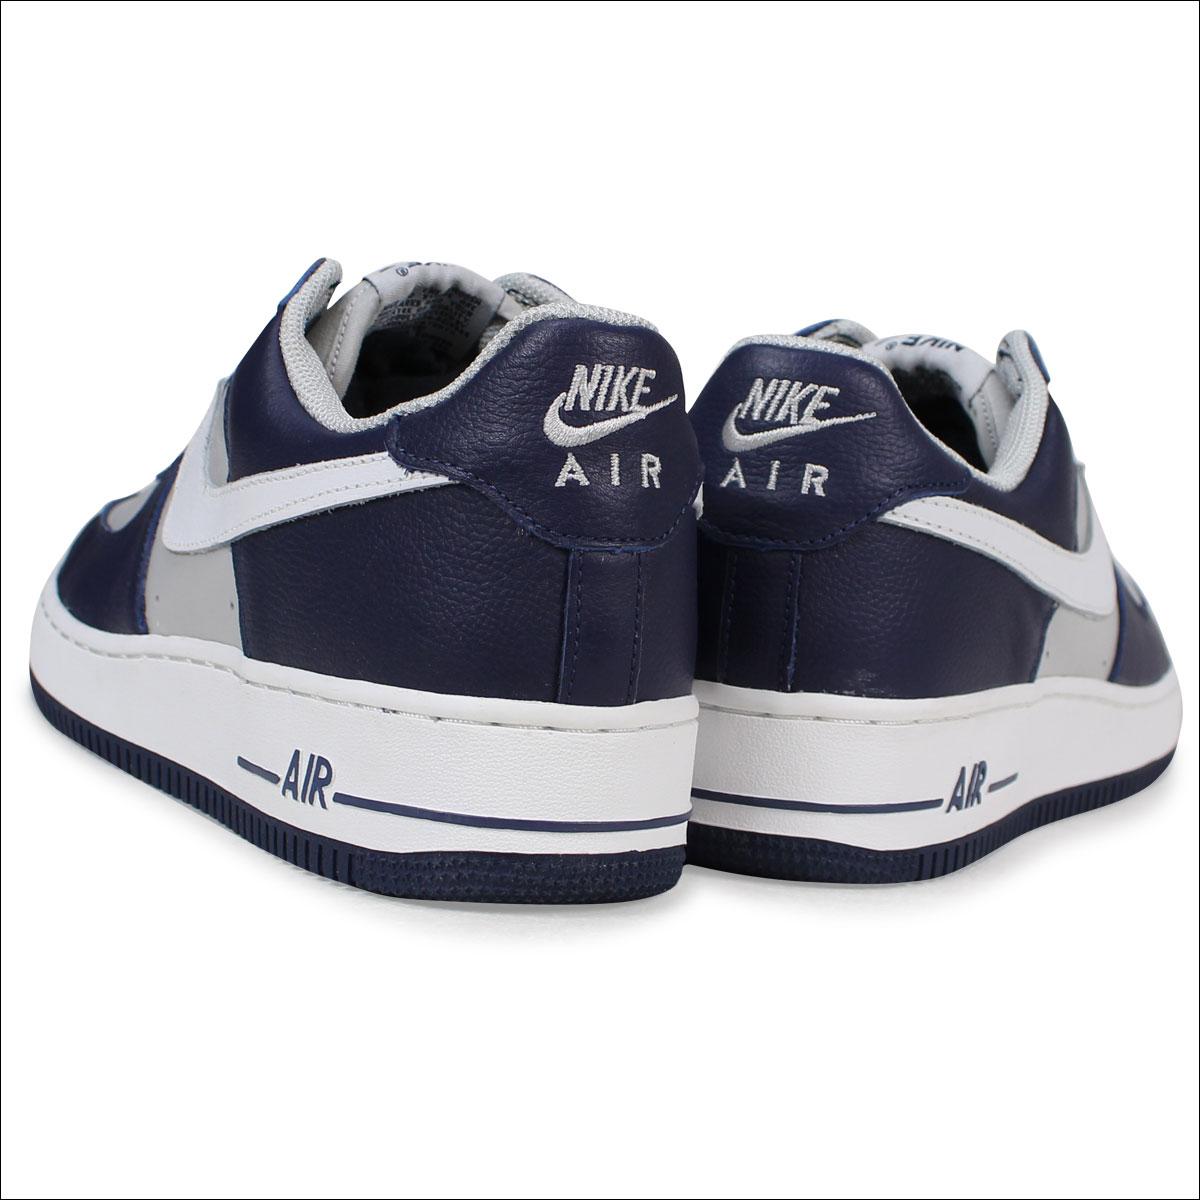 ca2d6c32dbc91 ... NIKE AIR FORCE 1 LOW Nike air force 1 sneakers 306,509-411 men's shoes  navy